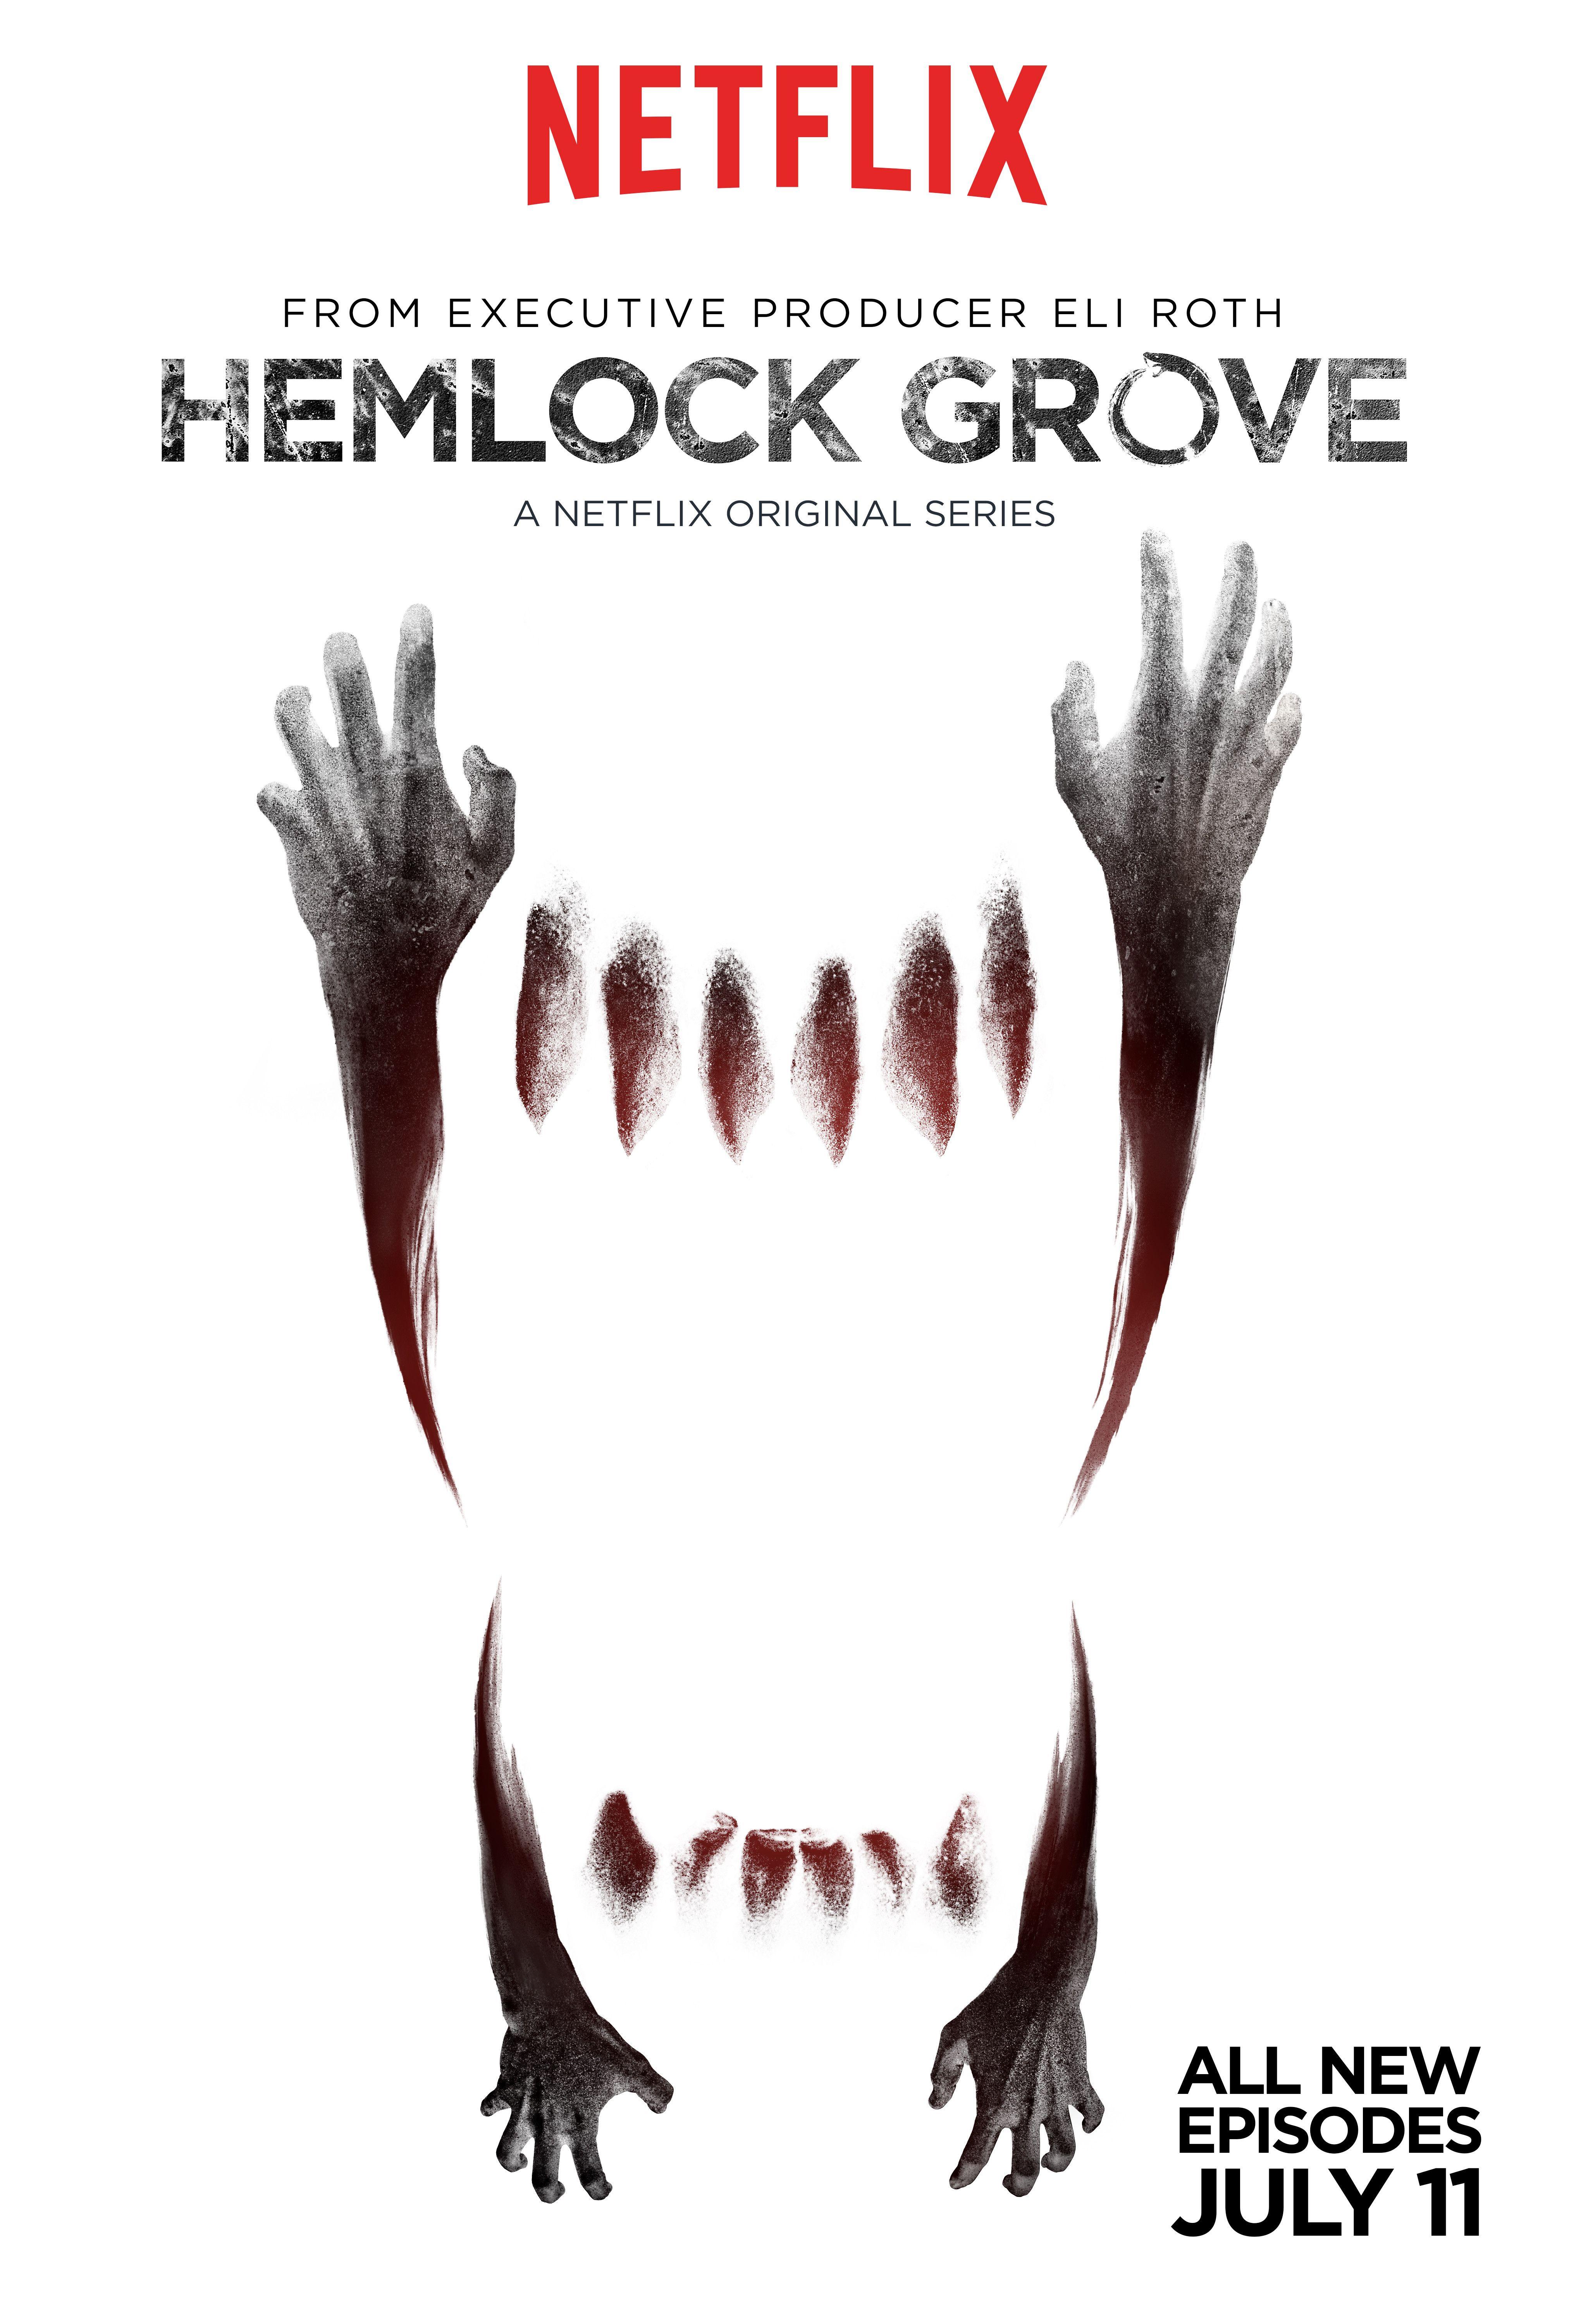 Hemlock Grove Season 3 Renewed By Netflix for 2015 | Collider